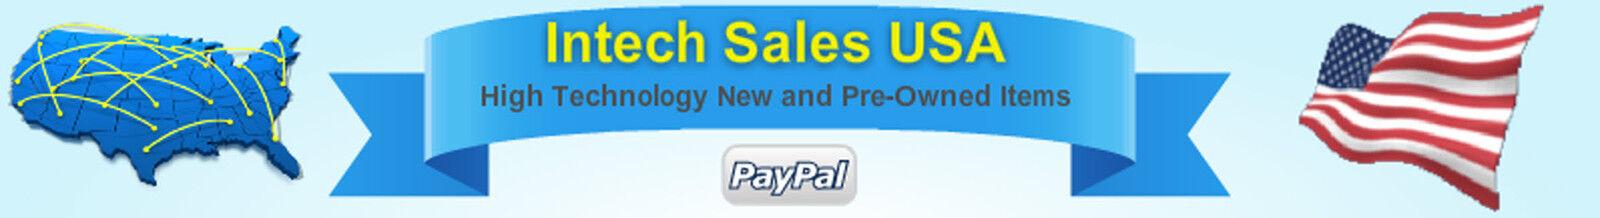 Intech Sales USA